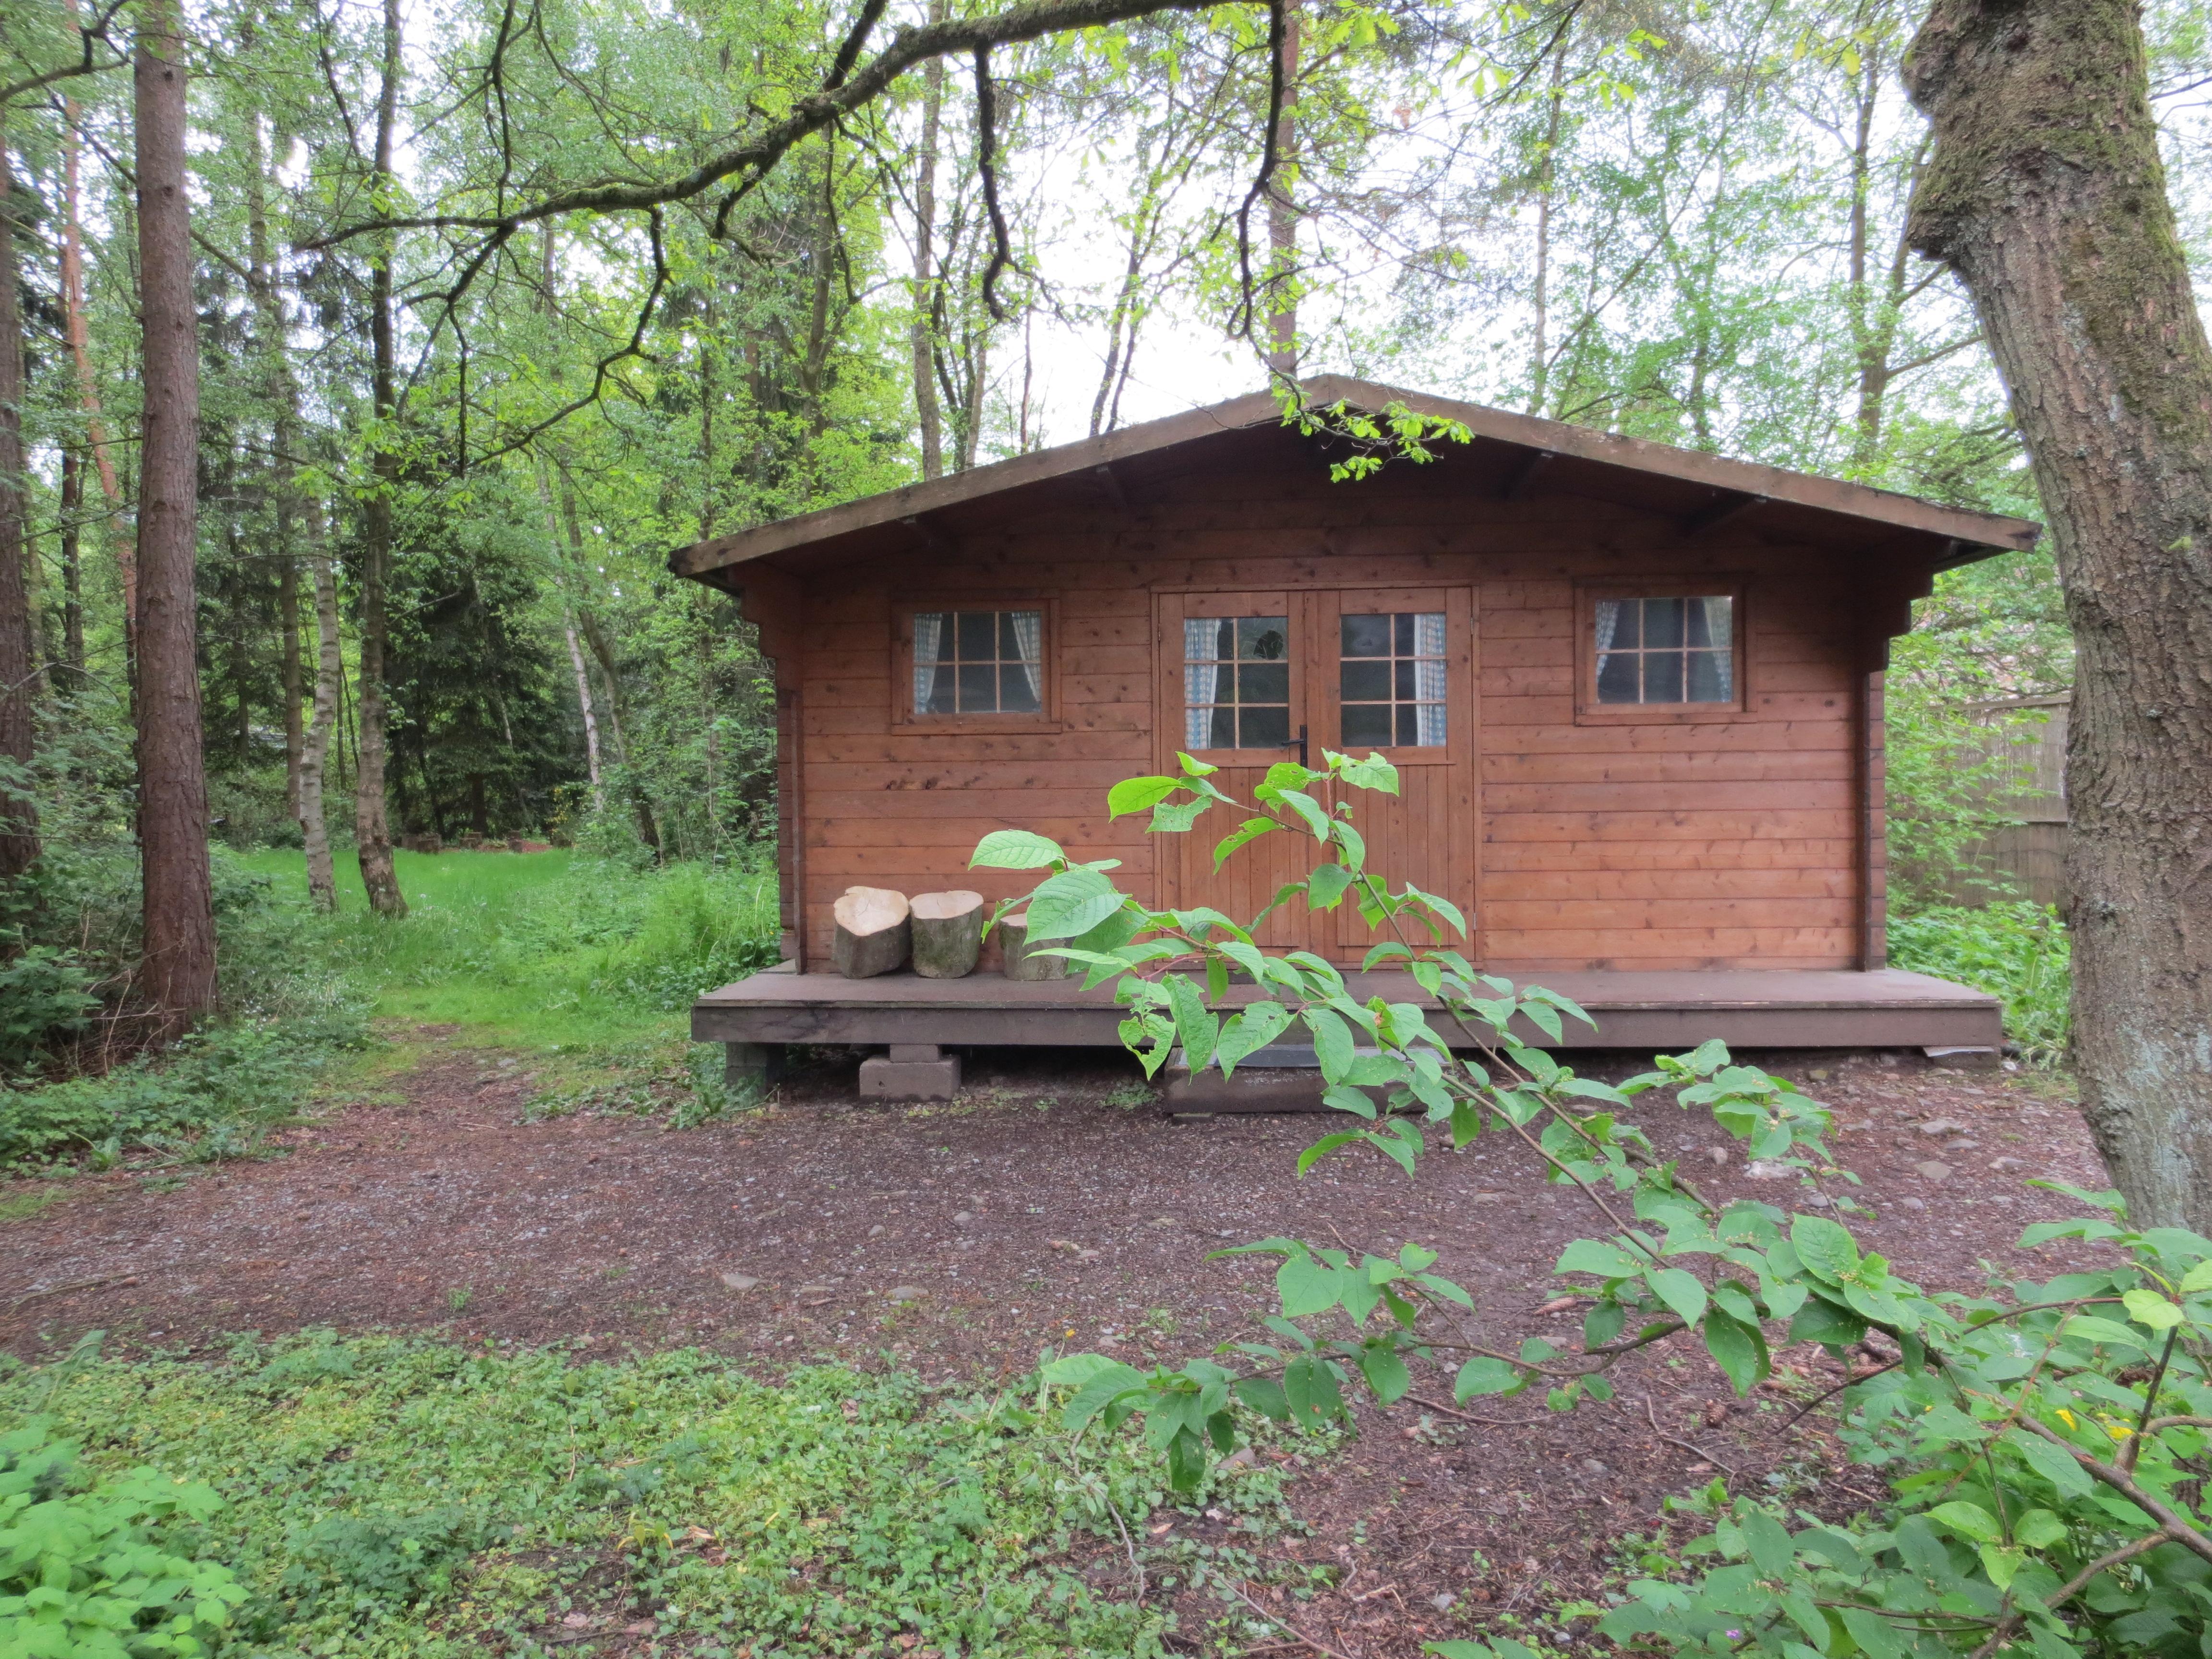 camping wesertal trekking hut